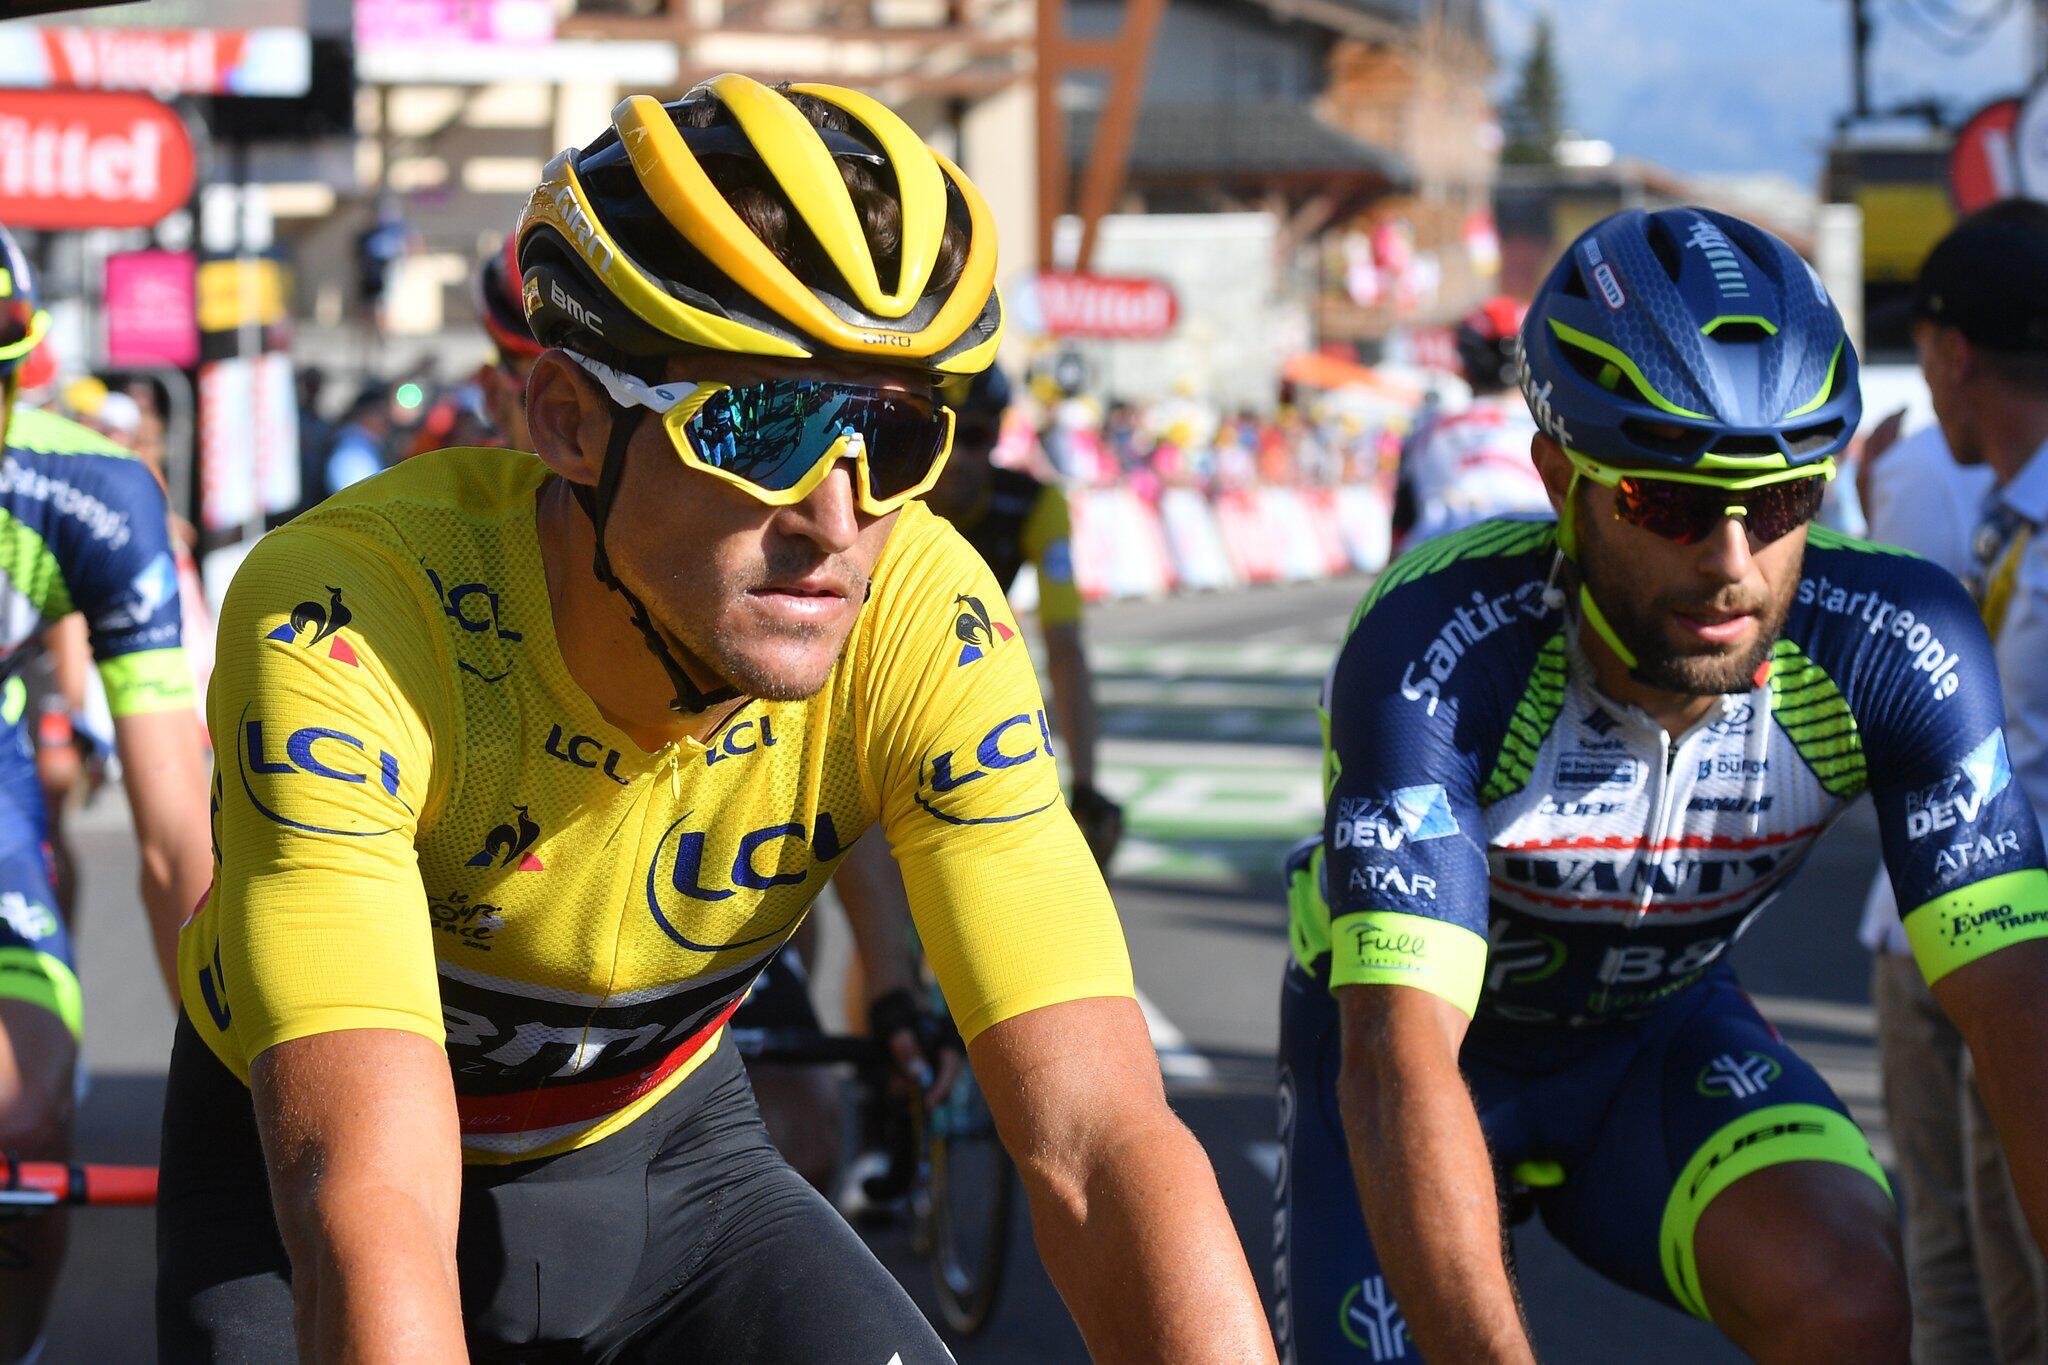 Bild zu Tour de France, 11. Etappe, Greg Van Avermaet